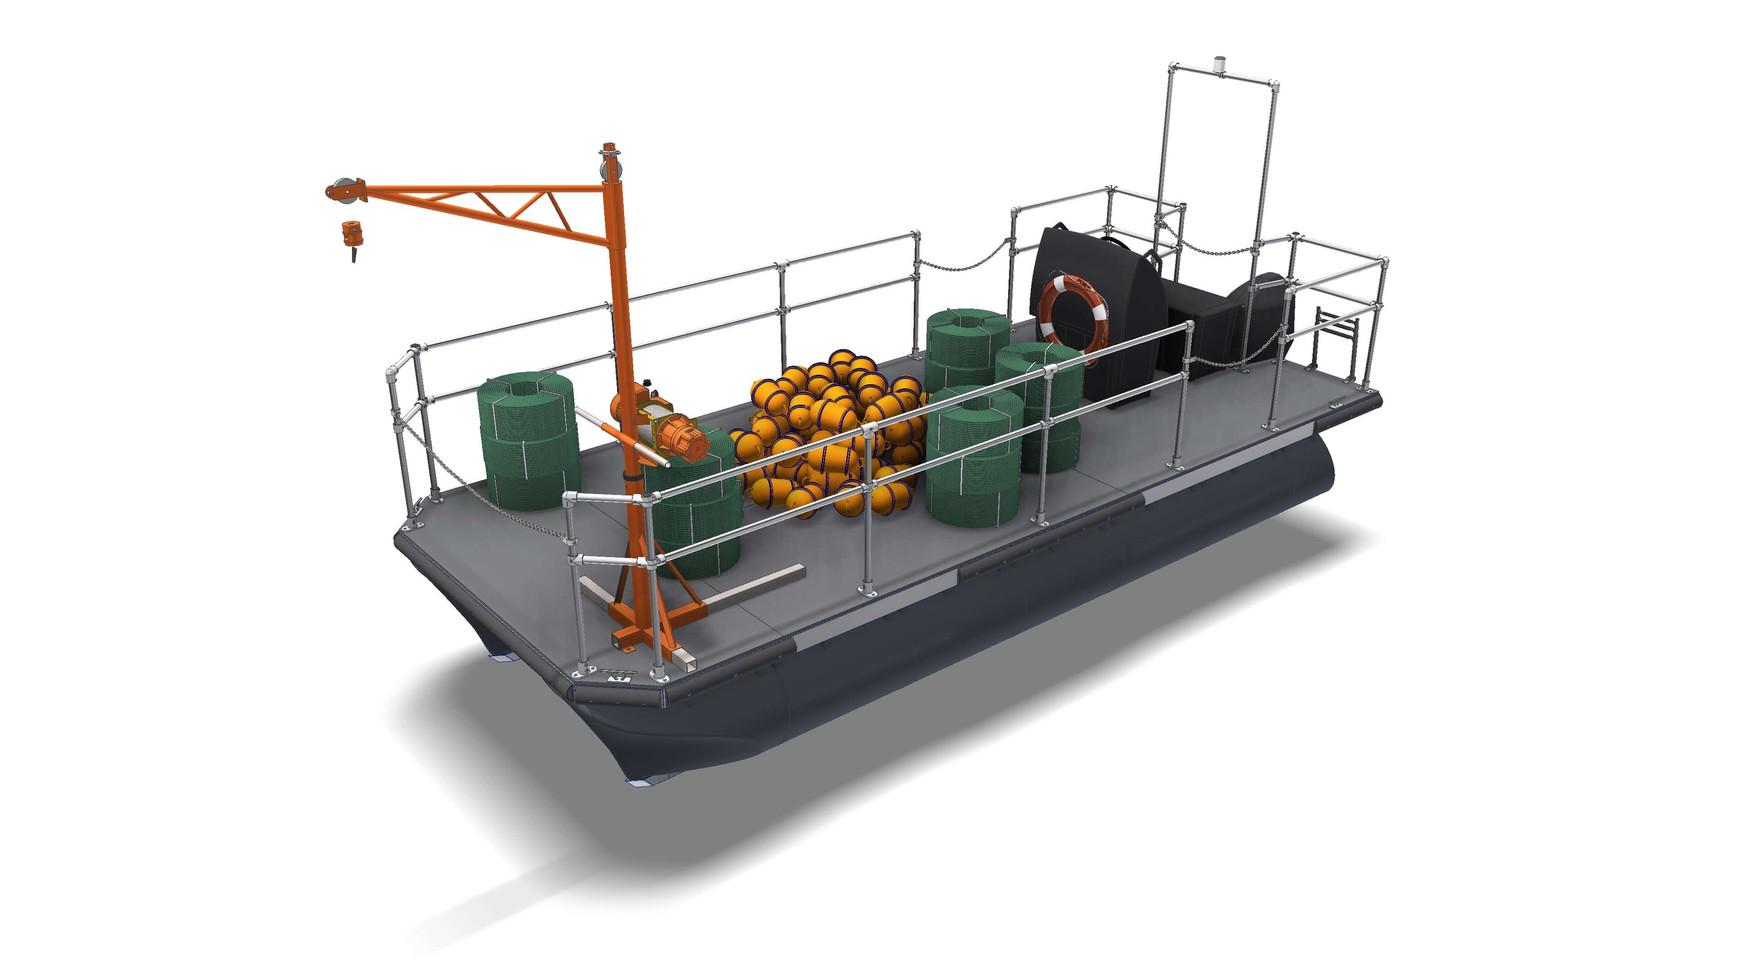 Catamaran for zone marking